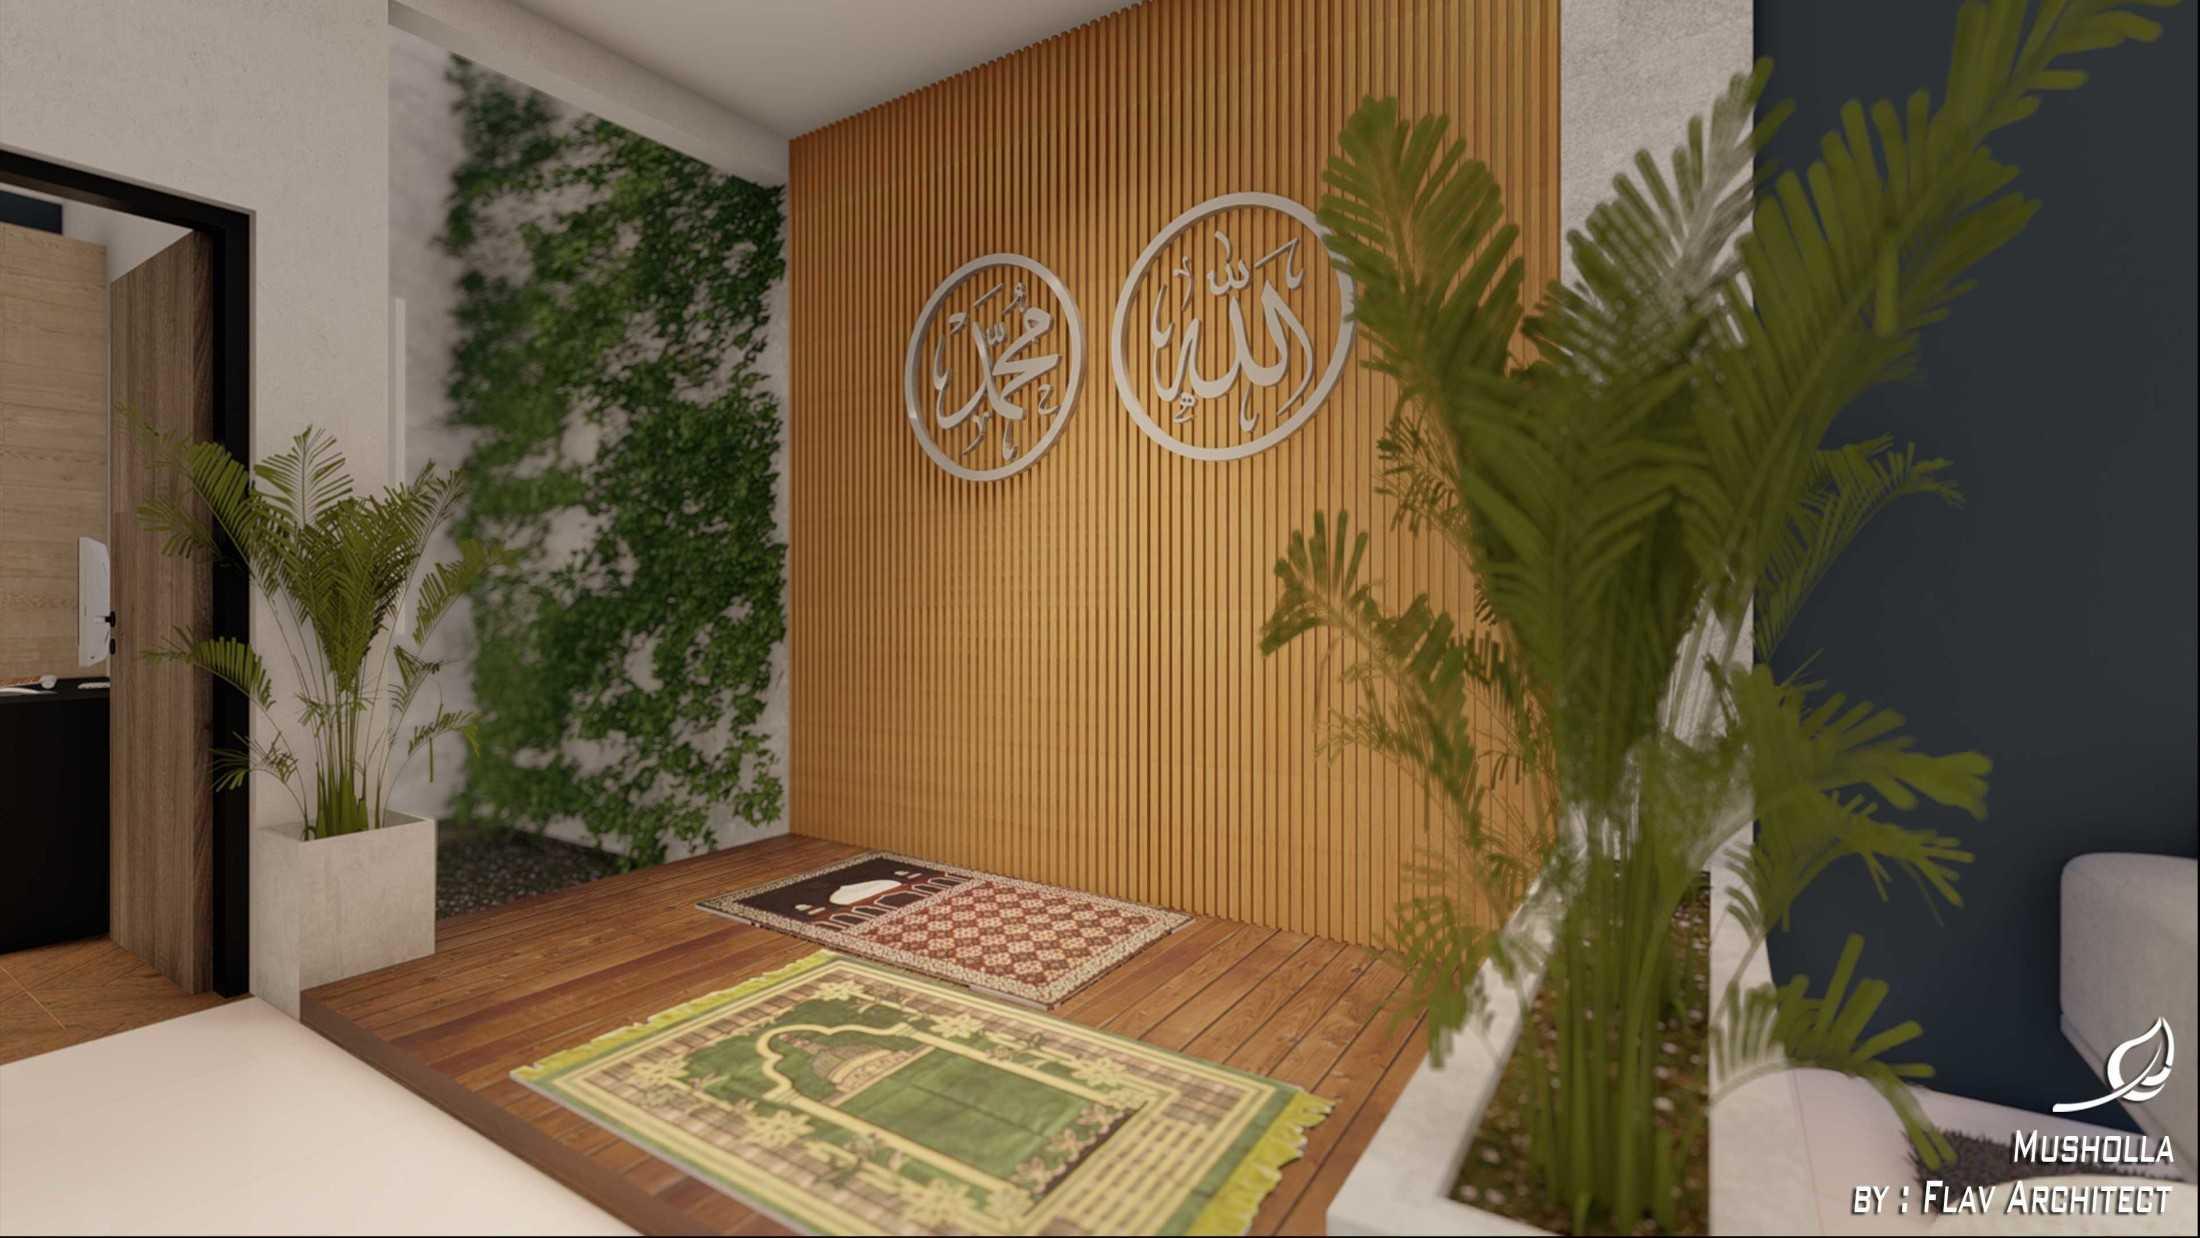 Flav Arsitek Mr. Budi House Tangerang, Kota Tangerang, Banten, Indonesia Tangerang, Kota Tangerang, Banten, Indonesia Flav-Arsitek-Mr-Budi-House  130332